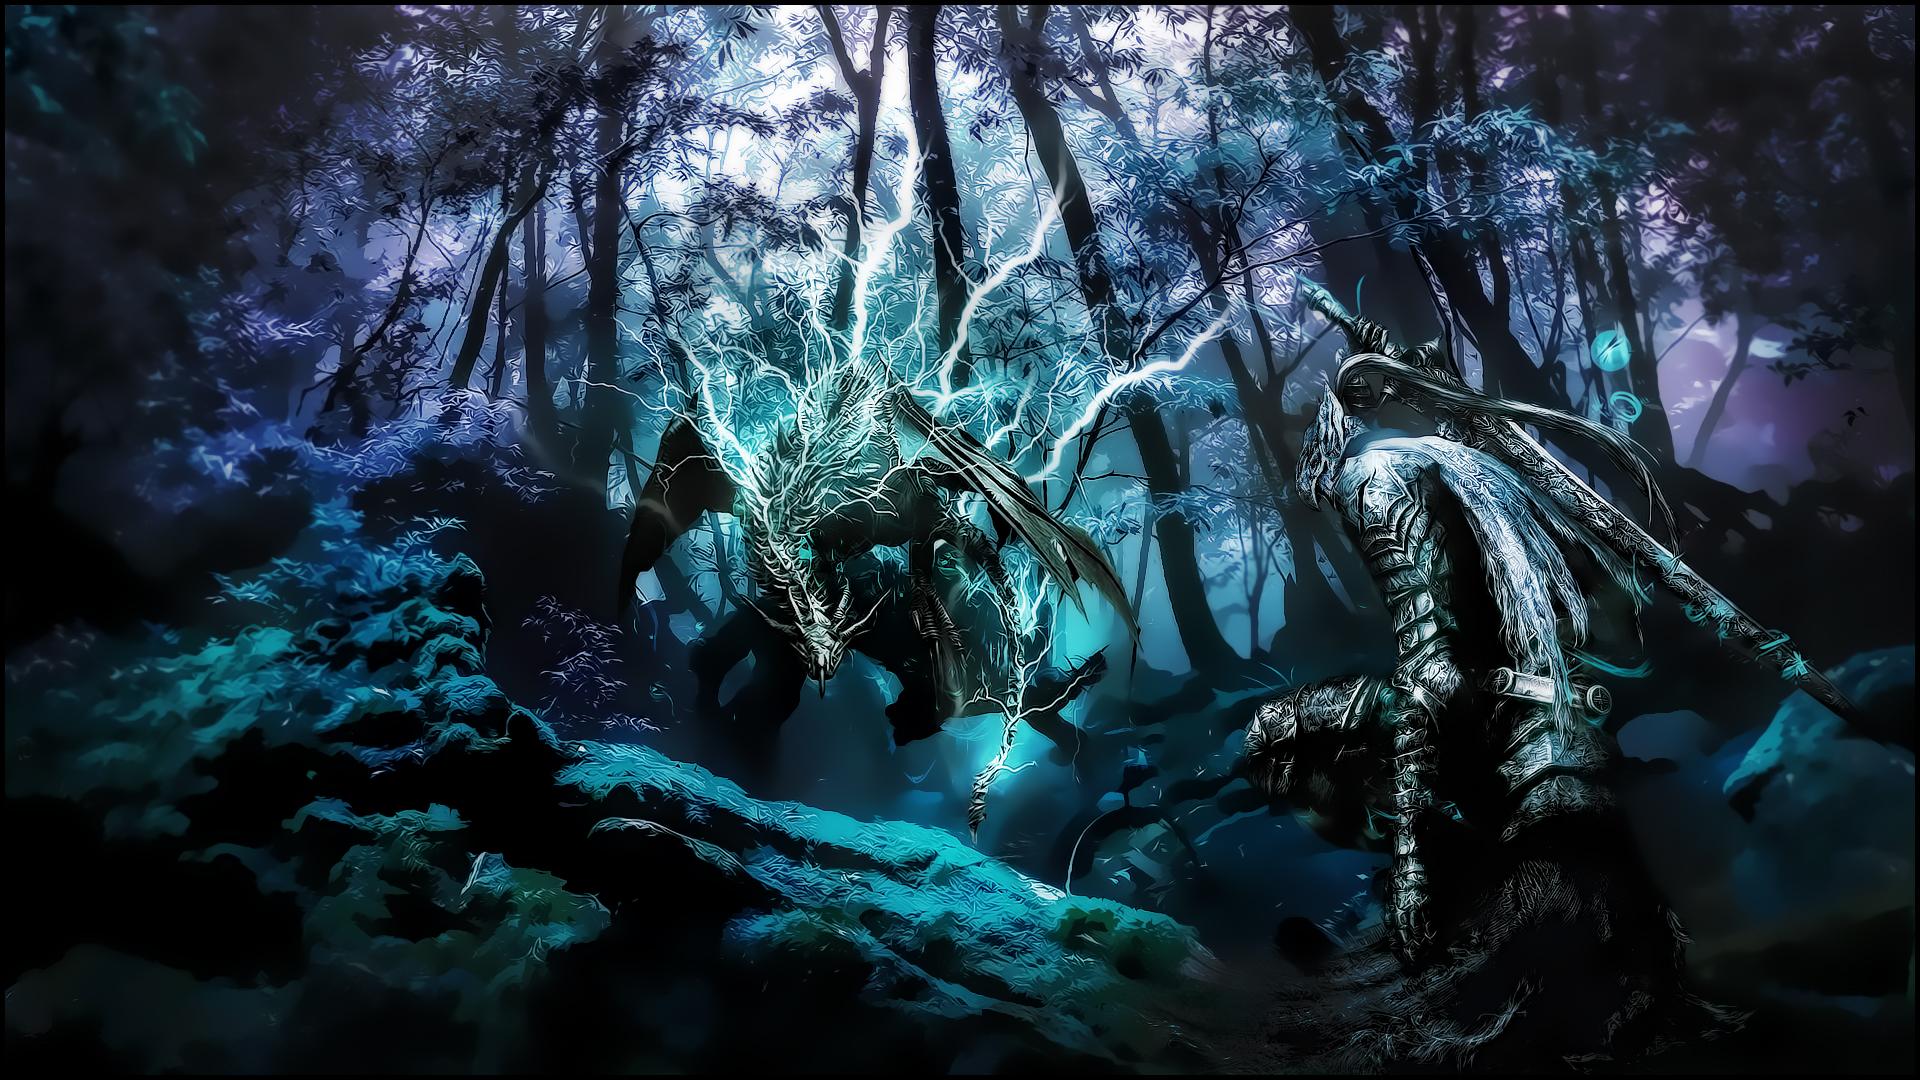 Dark Souls Background 1920x1080: Dark Souls Wallpaper By Malafil On DeviantArt